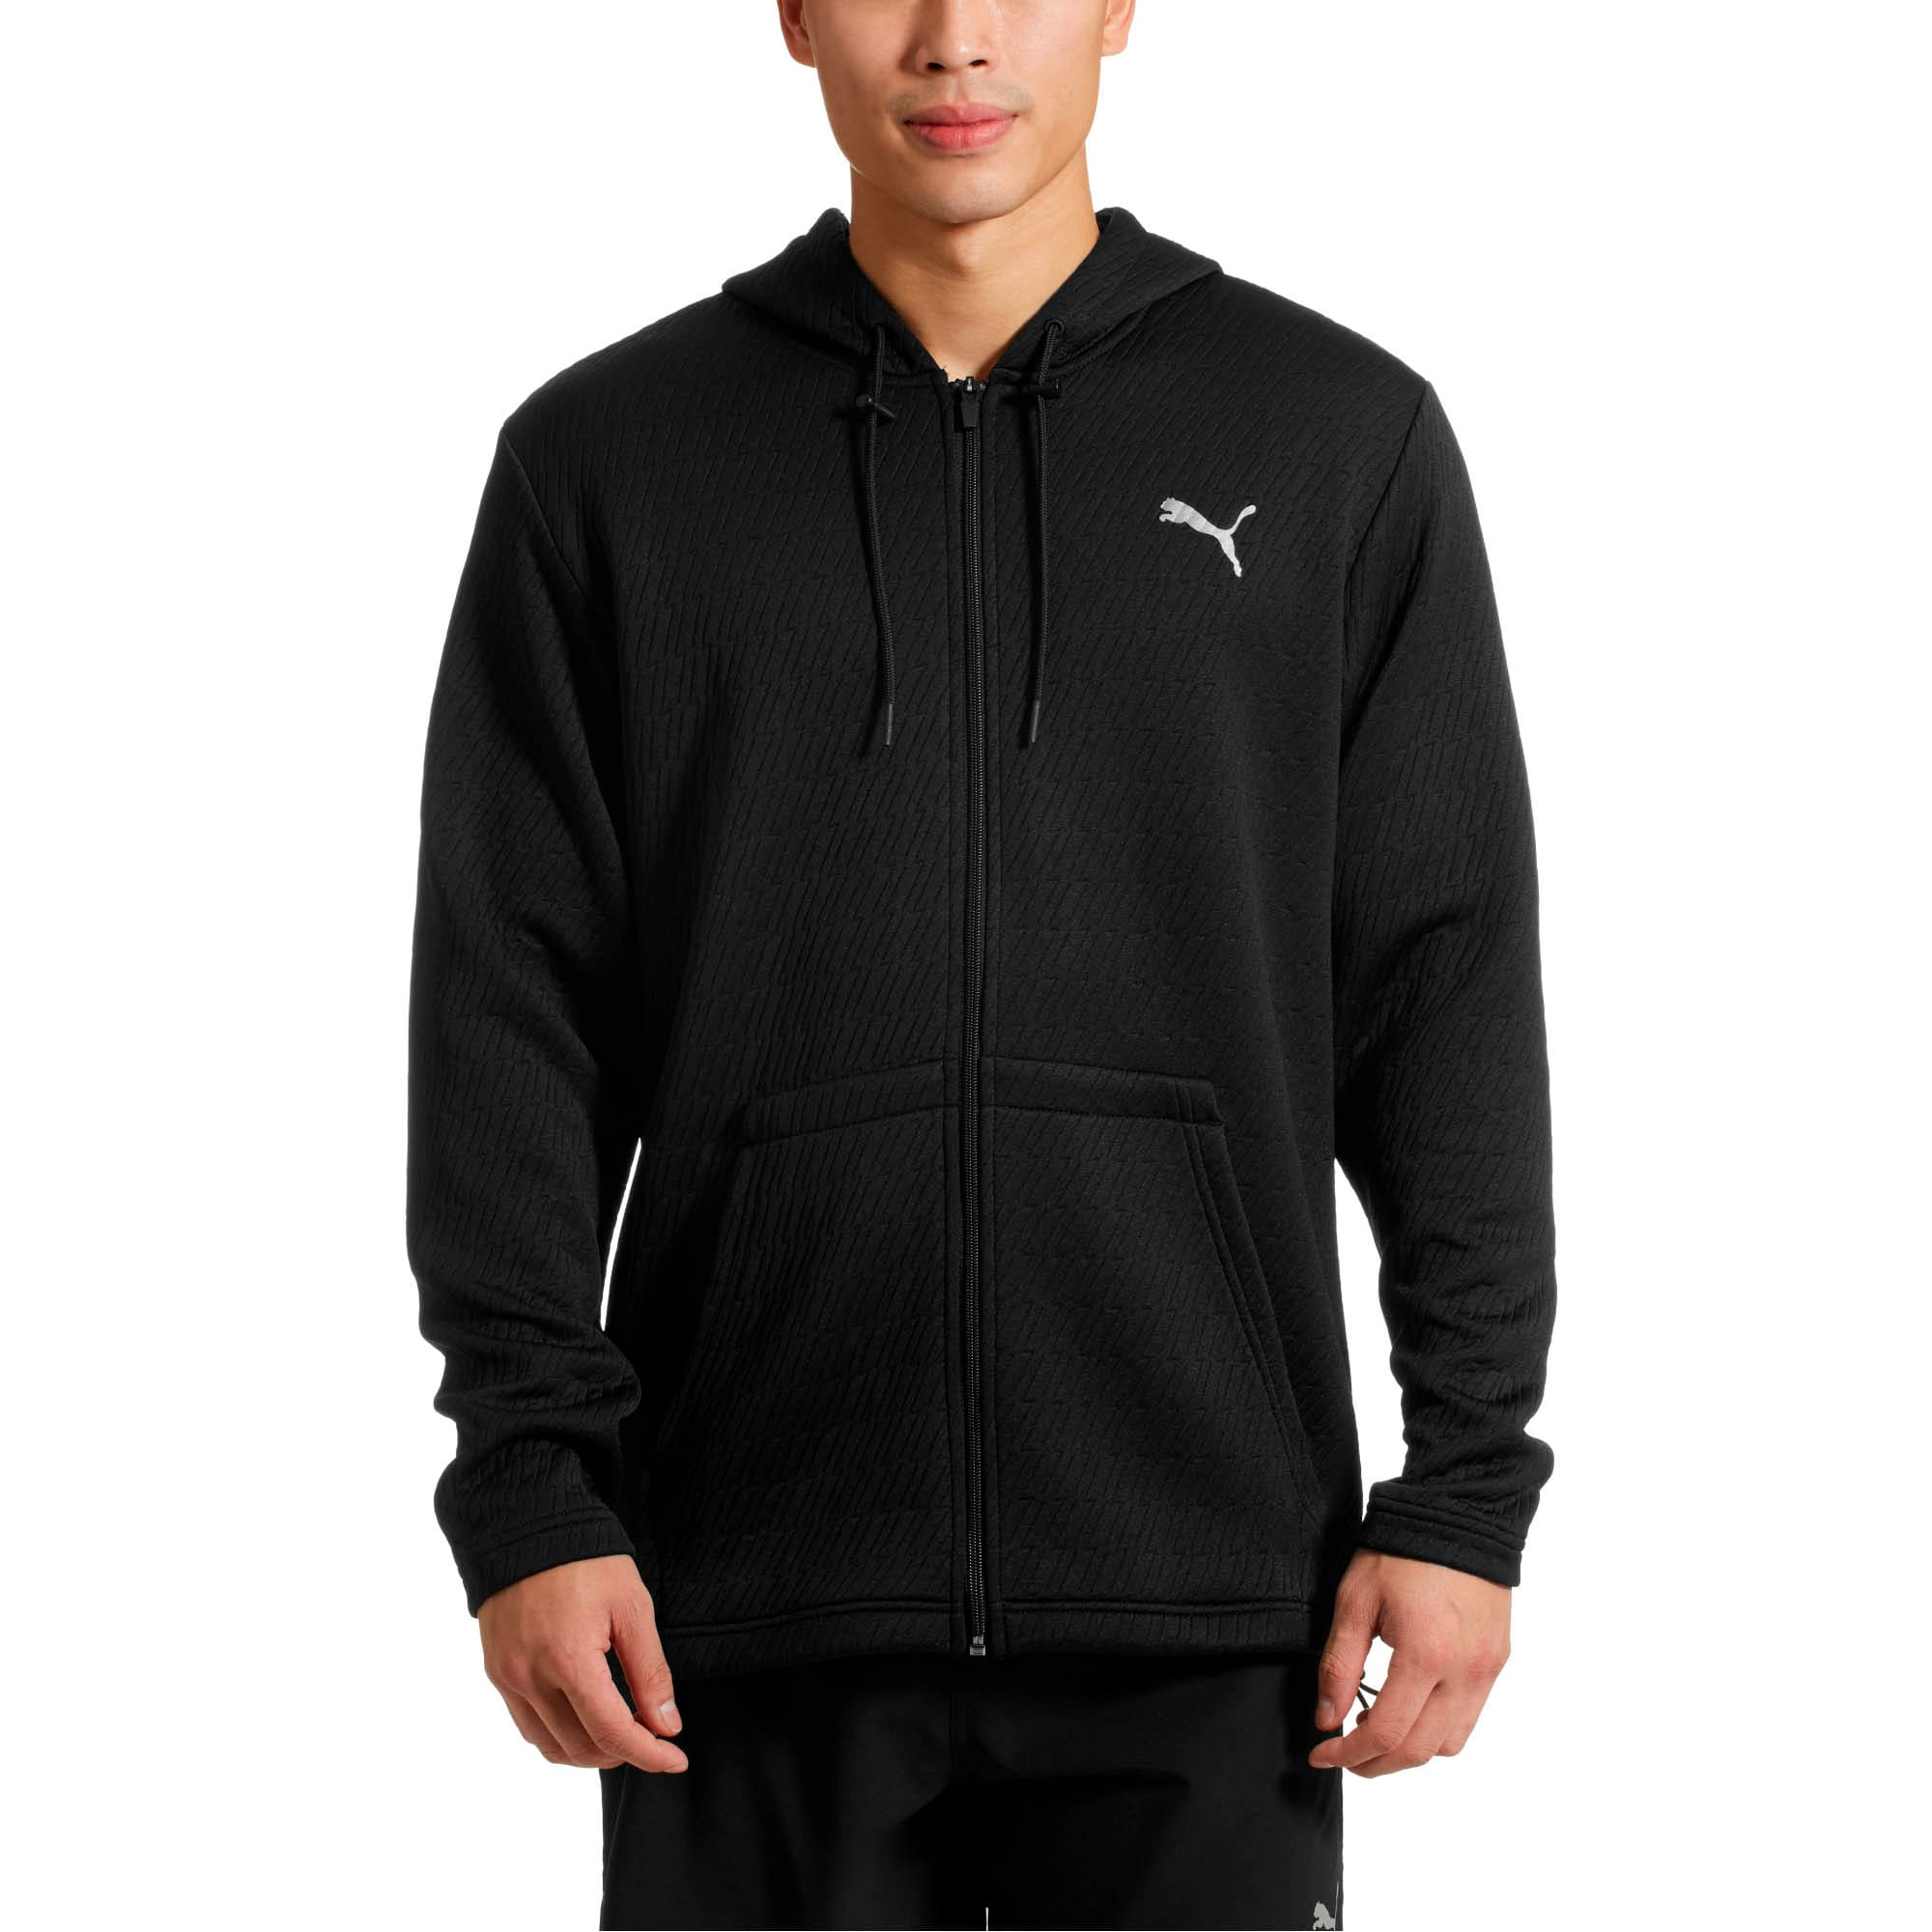 Thumbnail 2 of VENT Hooded Jacket, Puma Black, medium